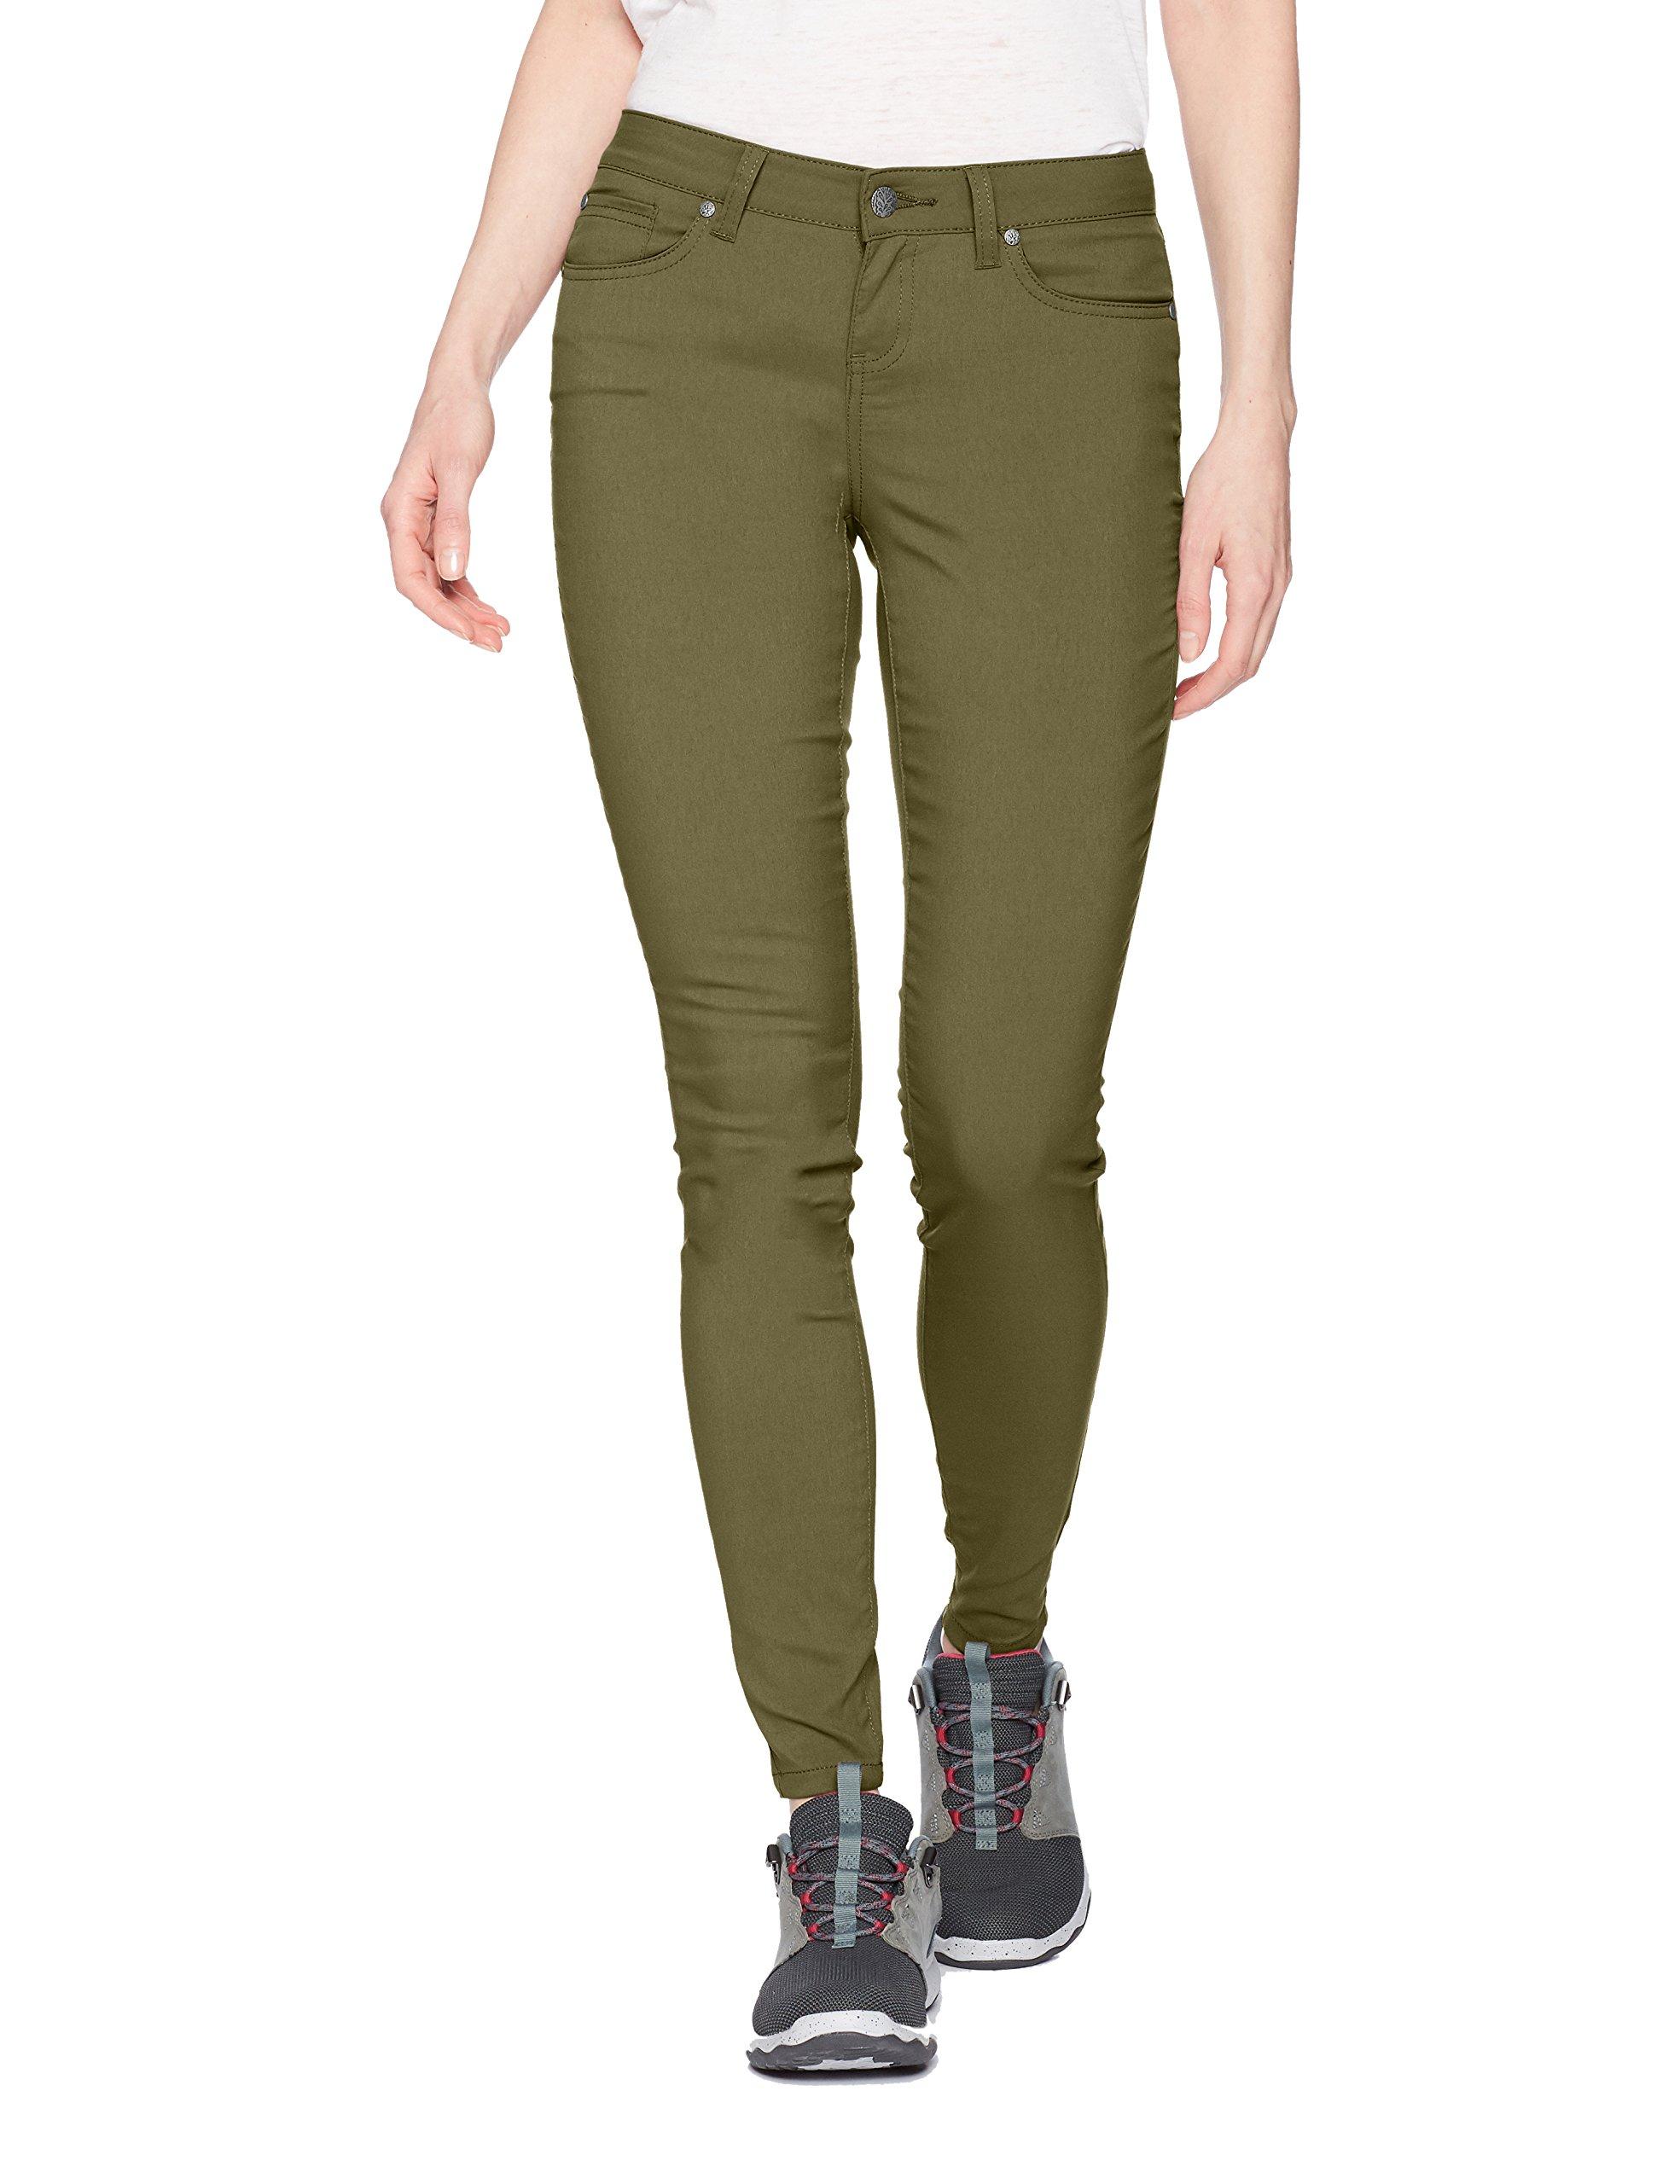 prAna Women's Petite Briann Pant, Cargo Green, 12 Short Inseam by prAna